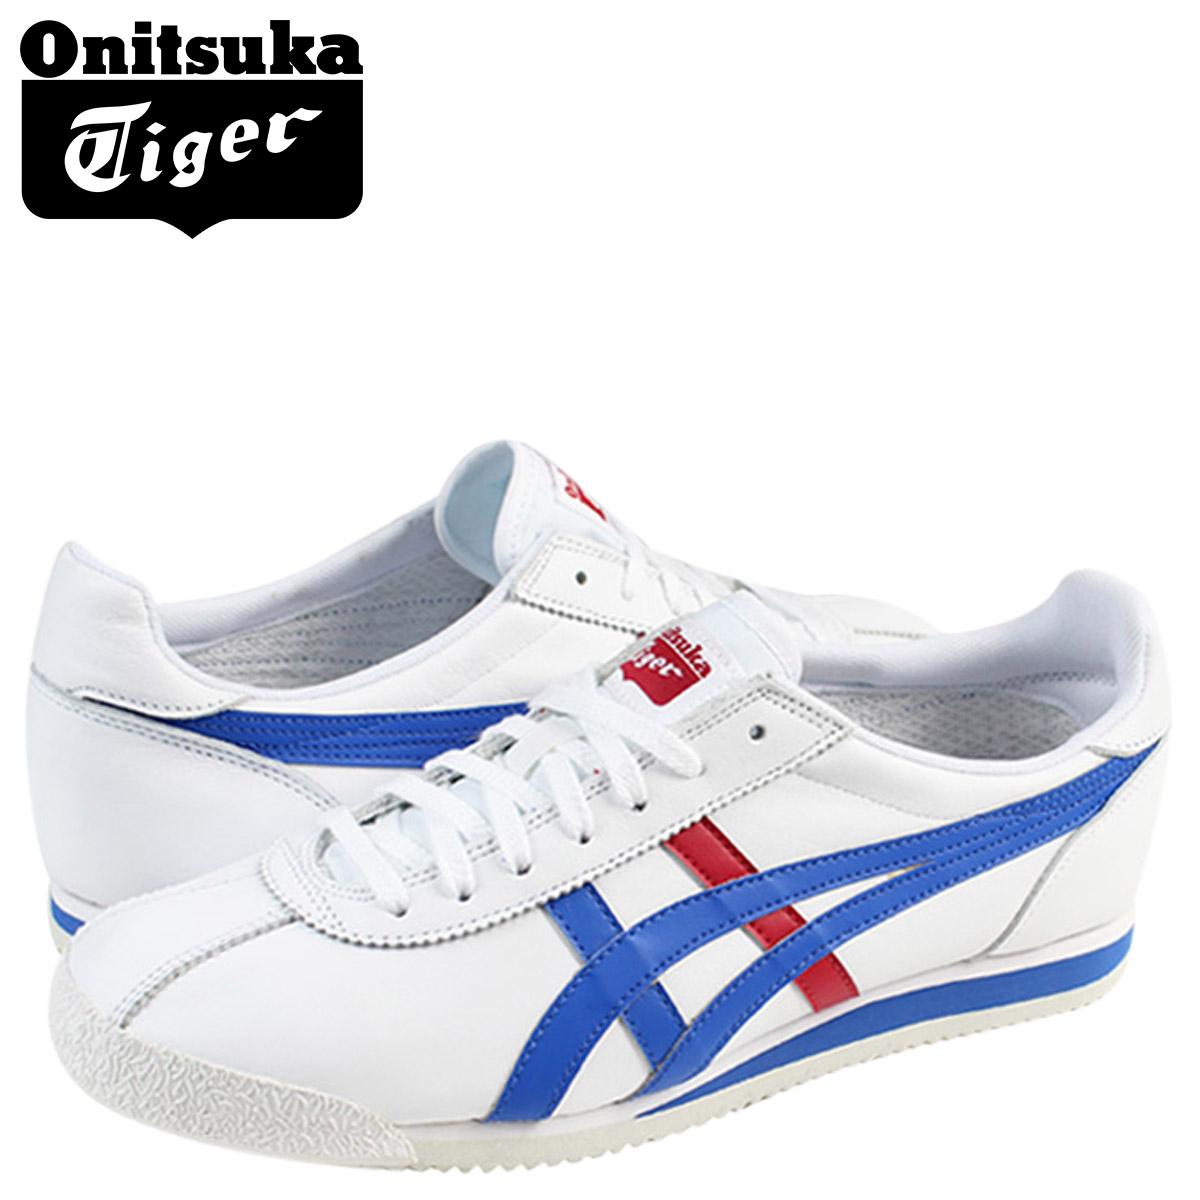 Onitsuka Tiger Keirin | Asics sneaker, Onitsuka tiger, Sneakers